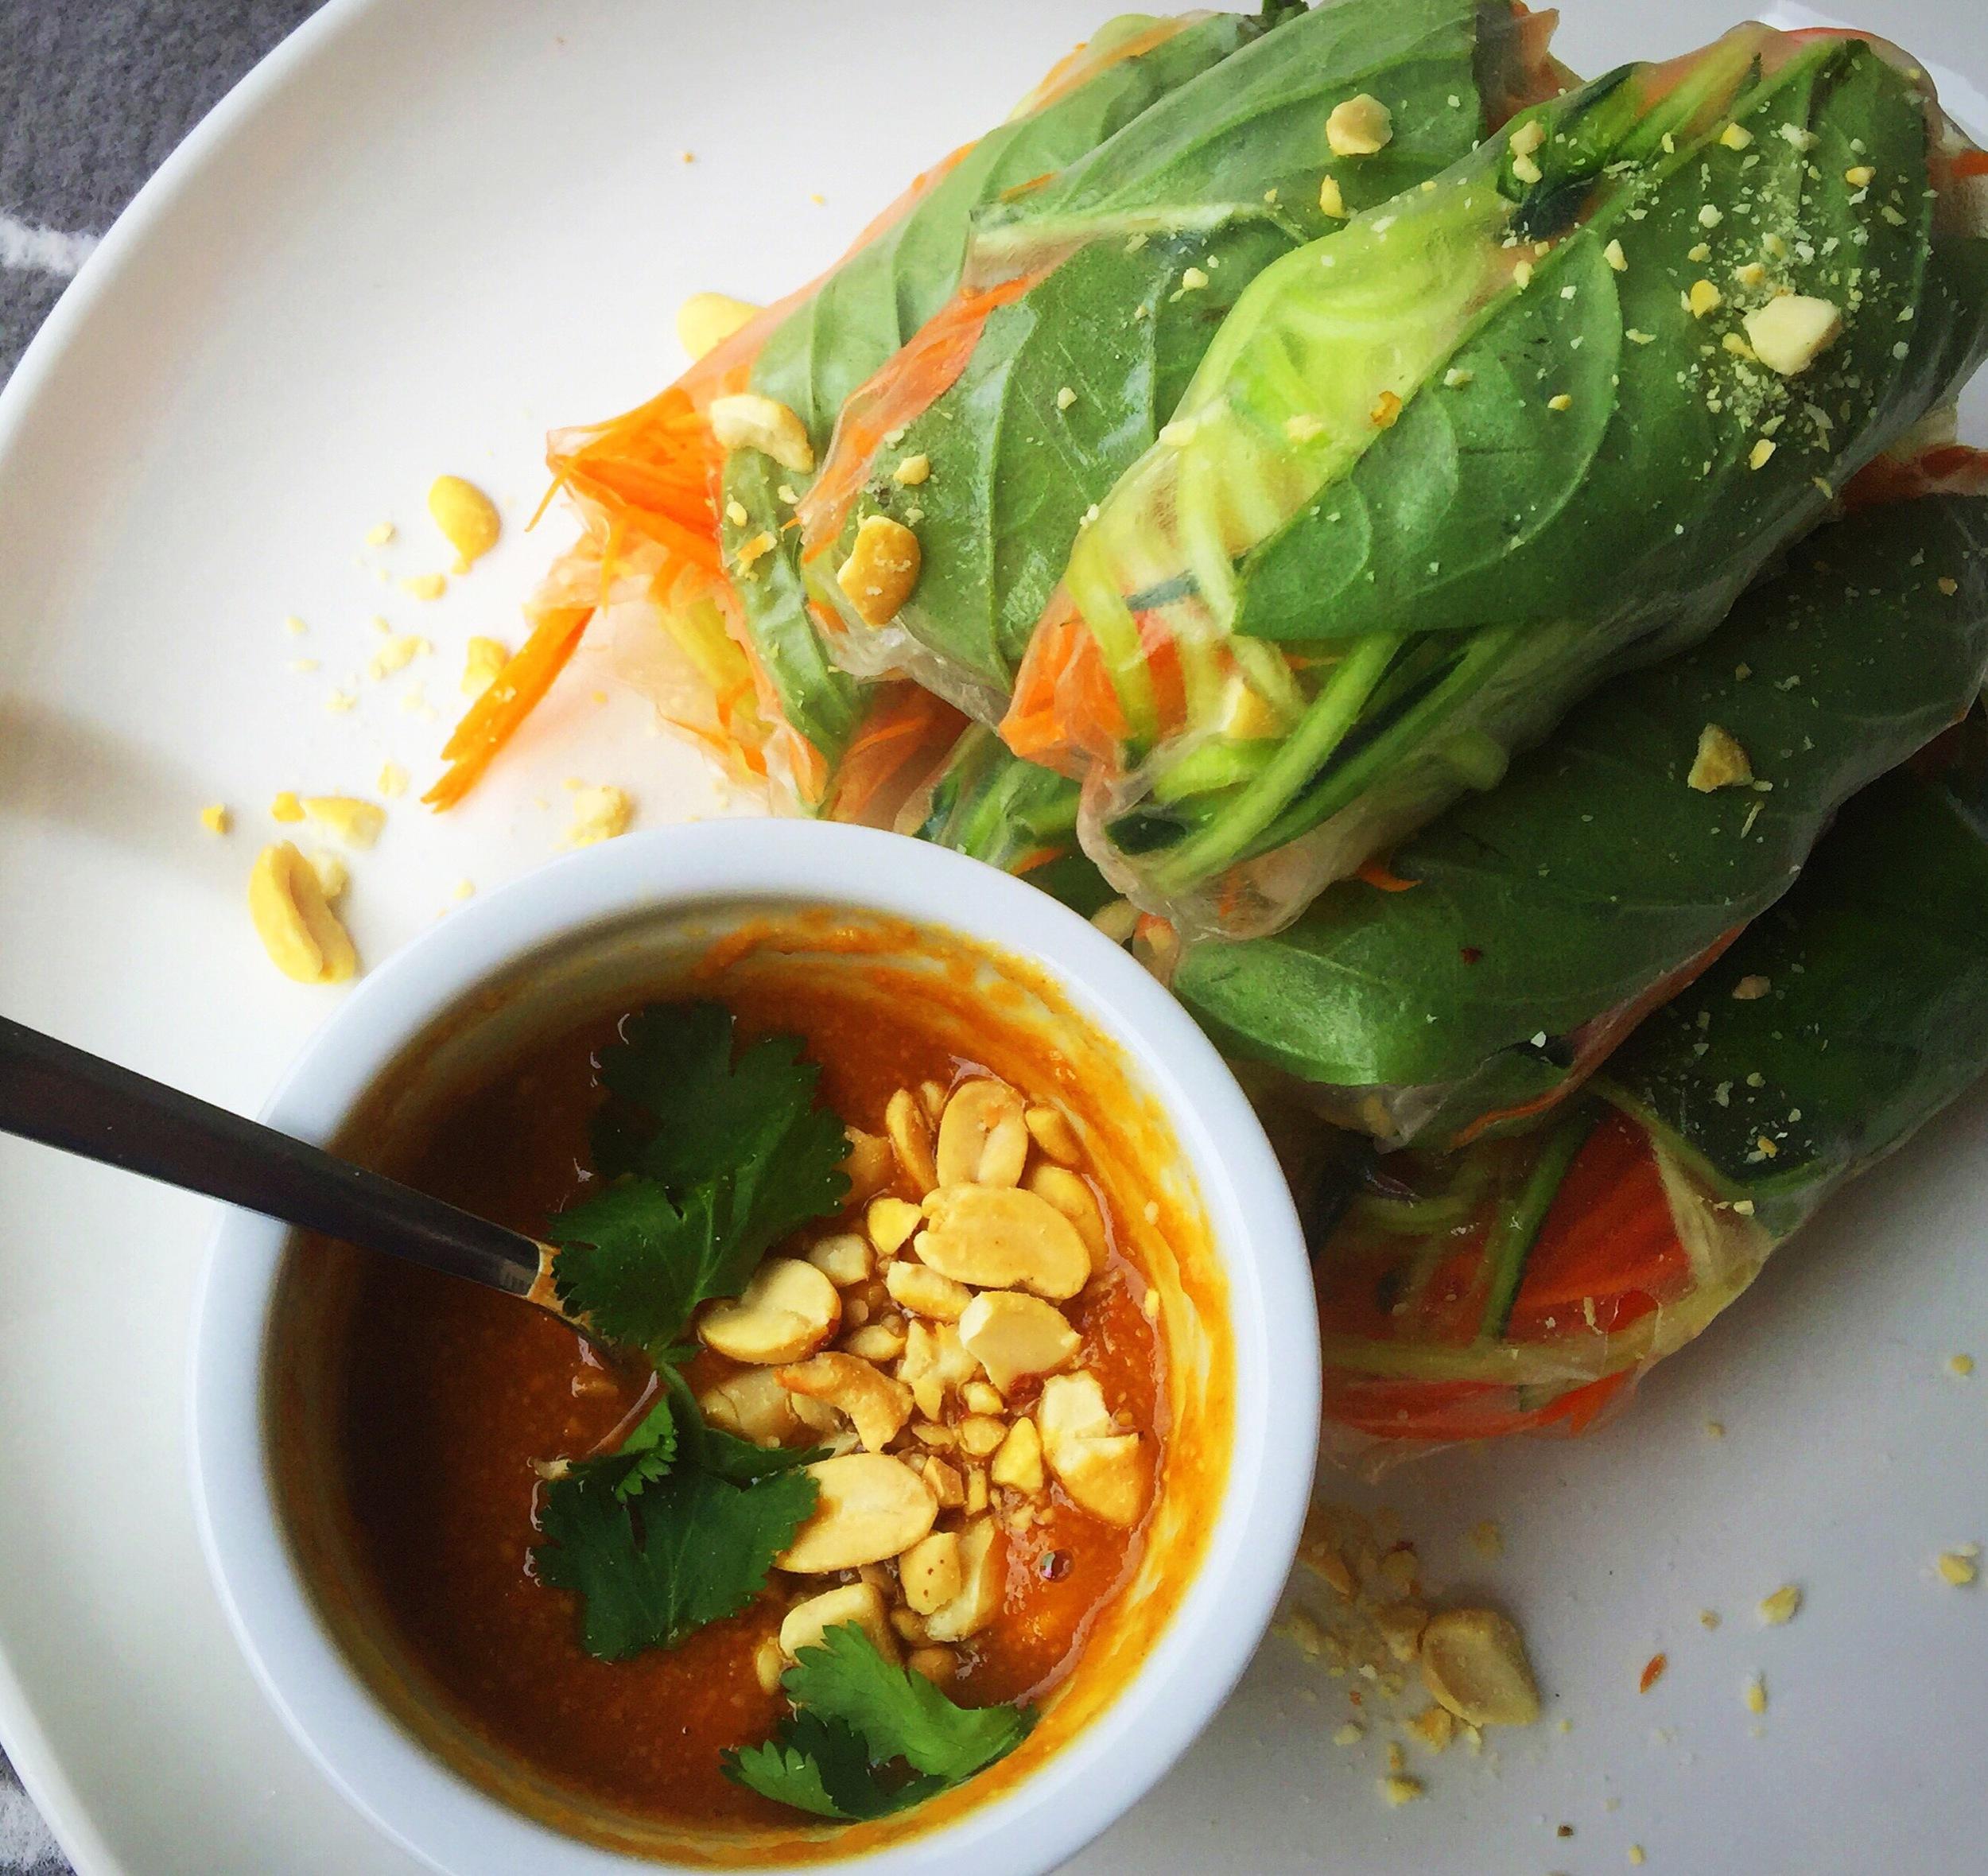 Thai Spring Rolls with Peanut Sauce